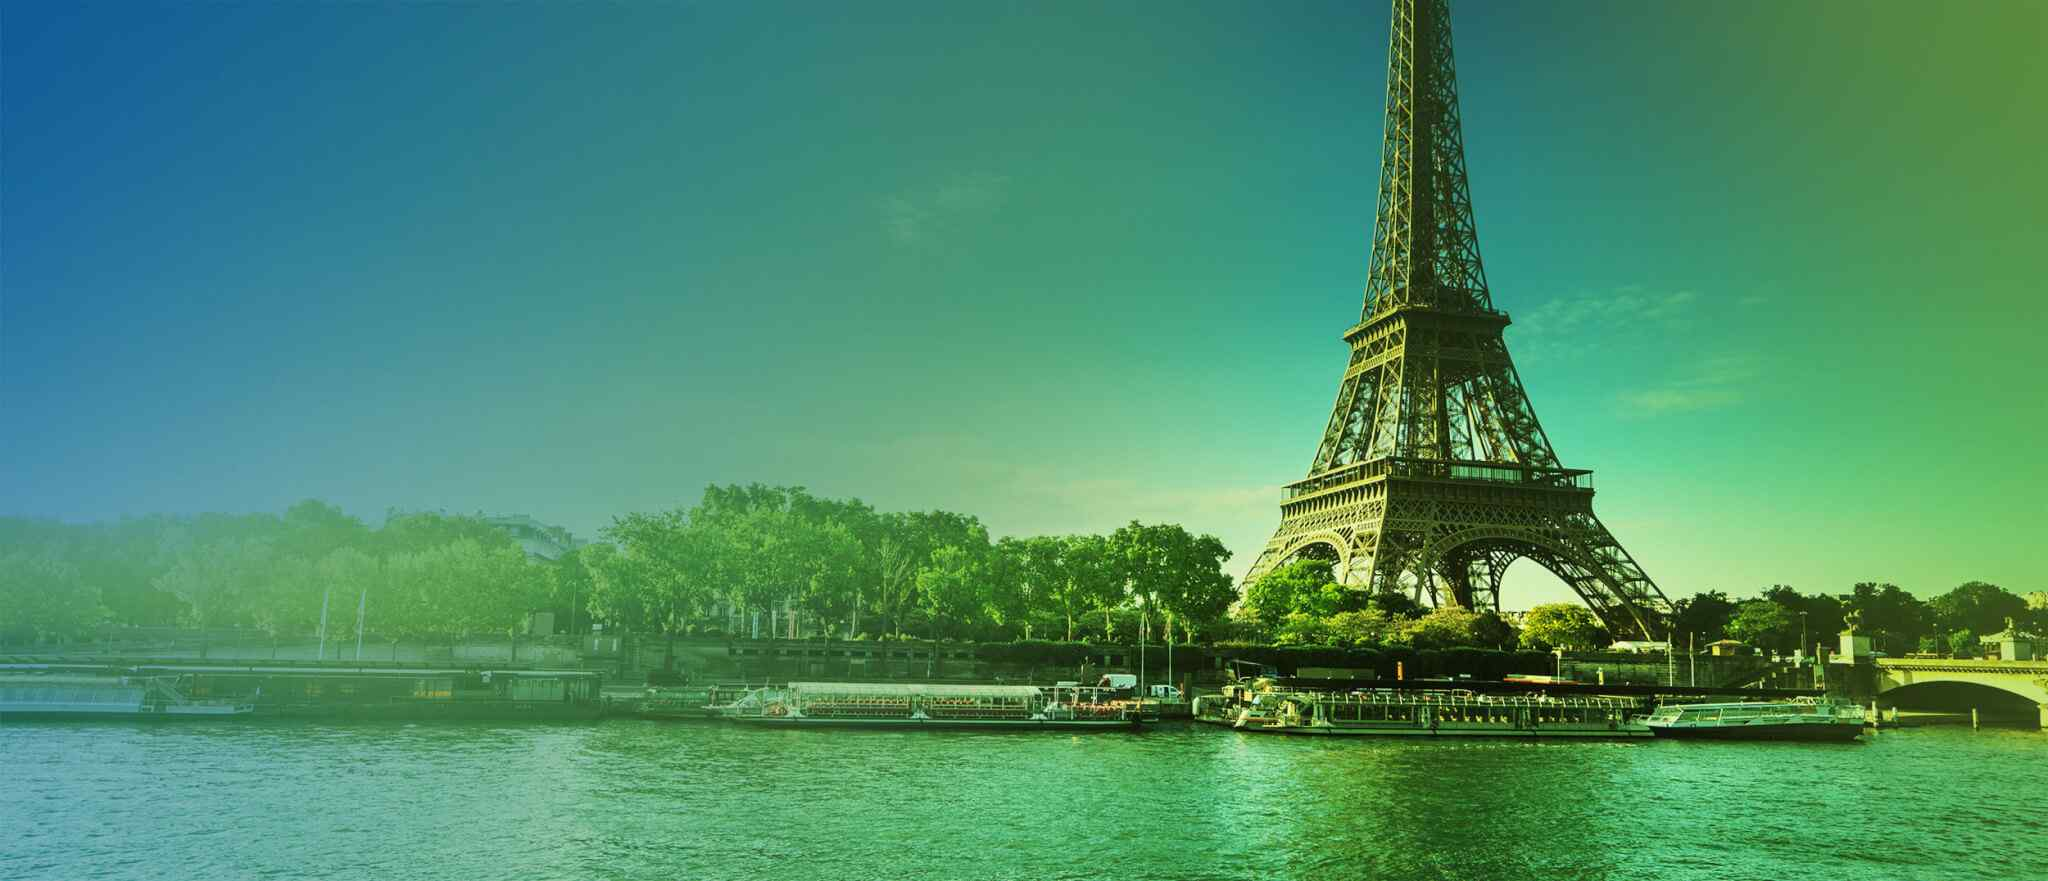 proline-travel-tourism-Lebanon-slider-paris